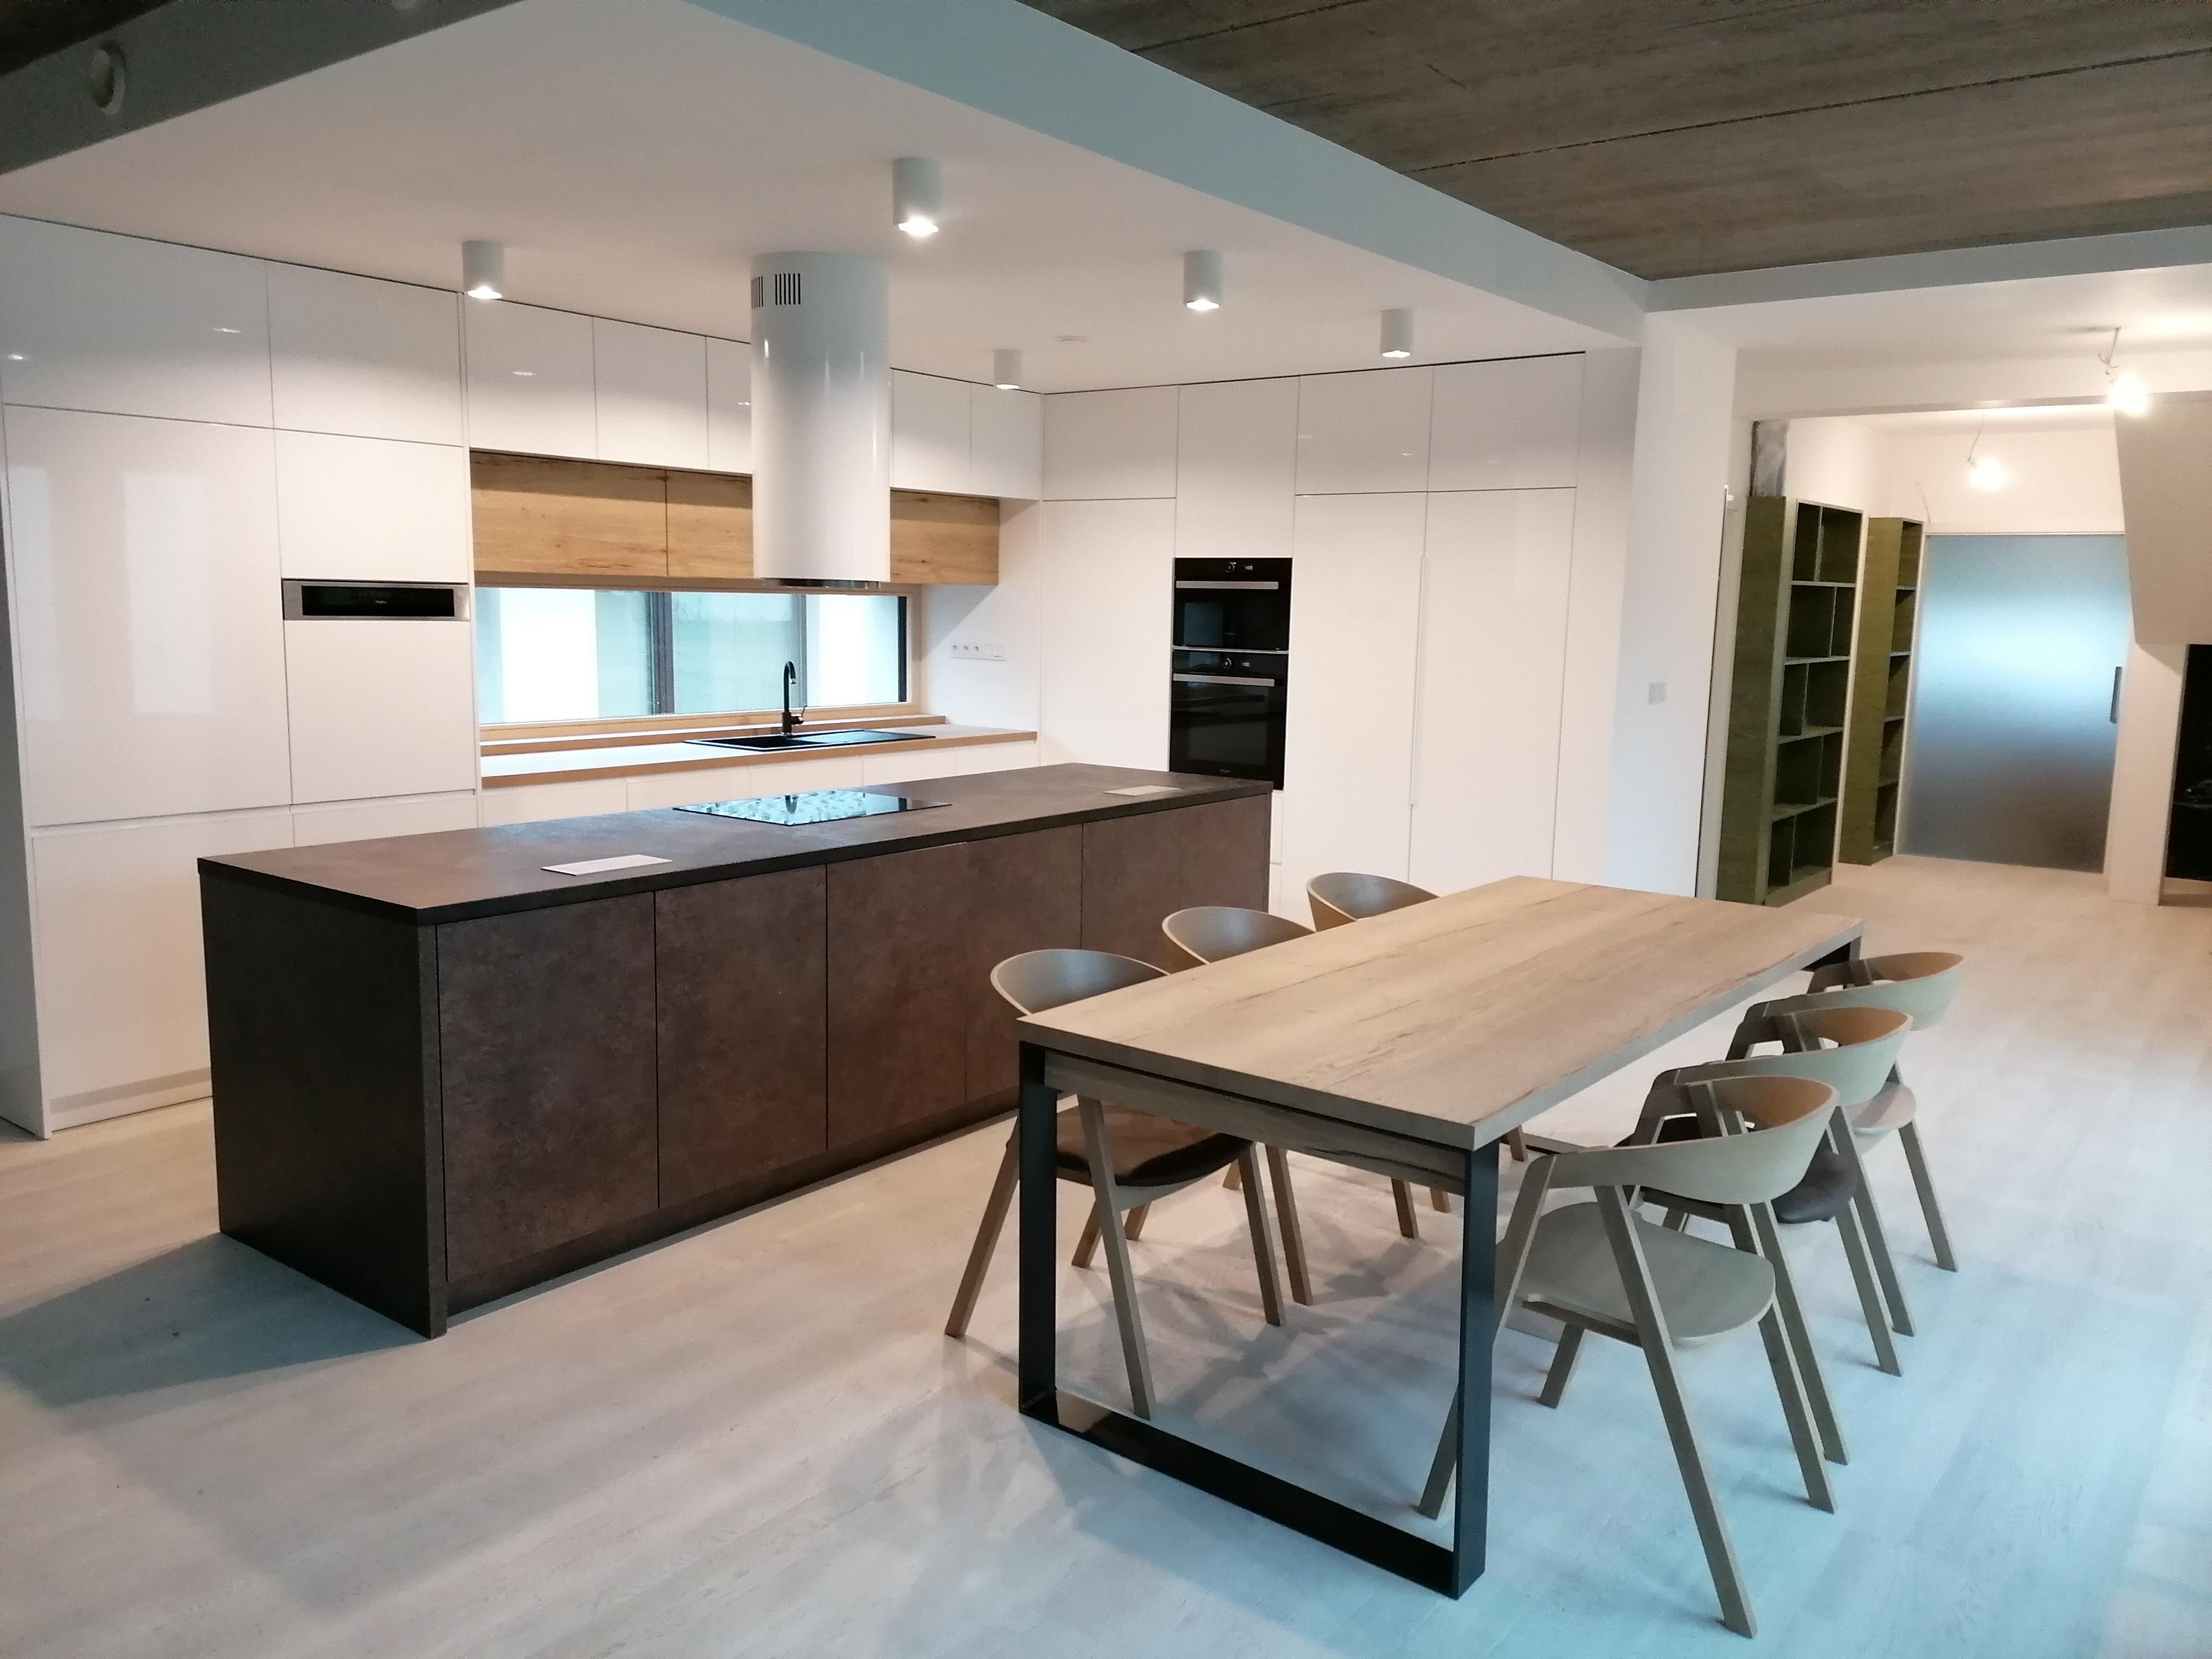 Kuchyňská linka s ostrůvkem dub kamenný / bílý lesk